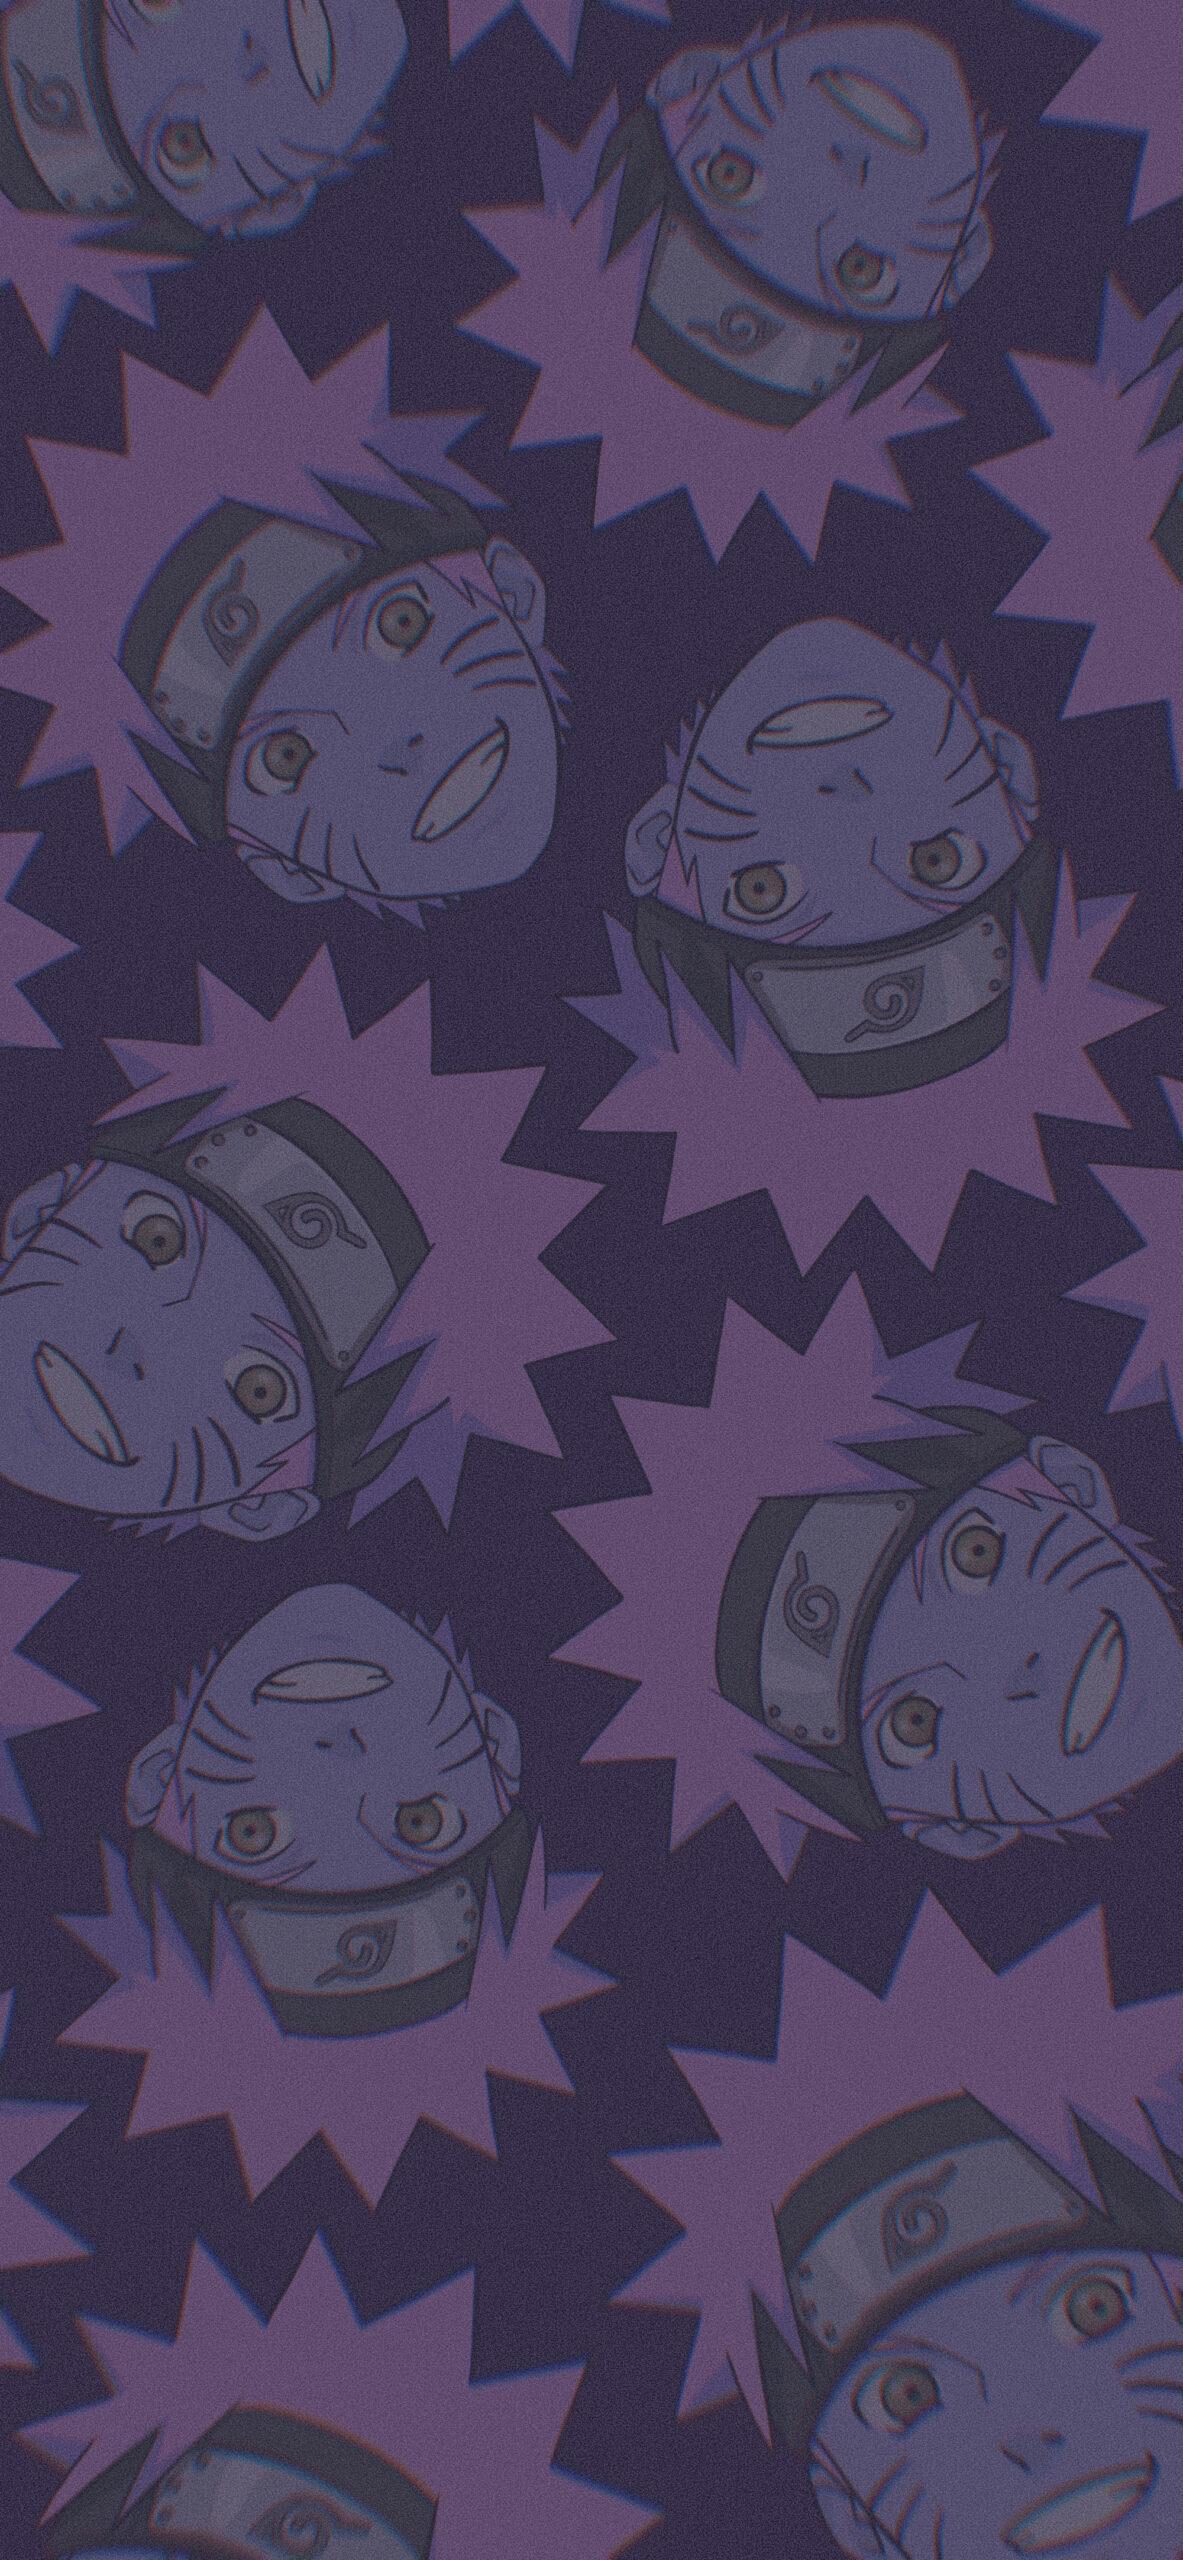 smiling naruto purple background